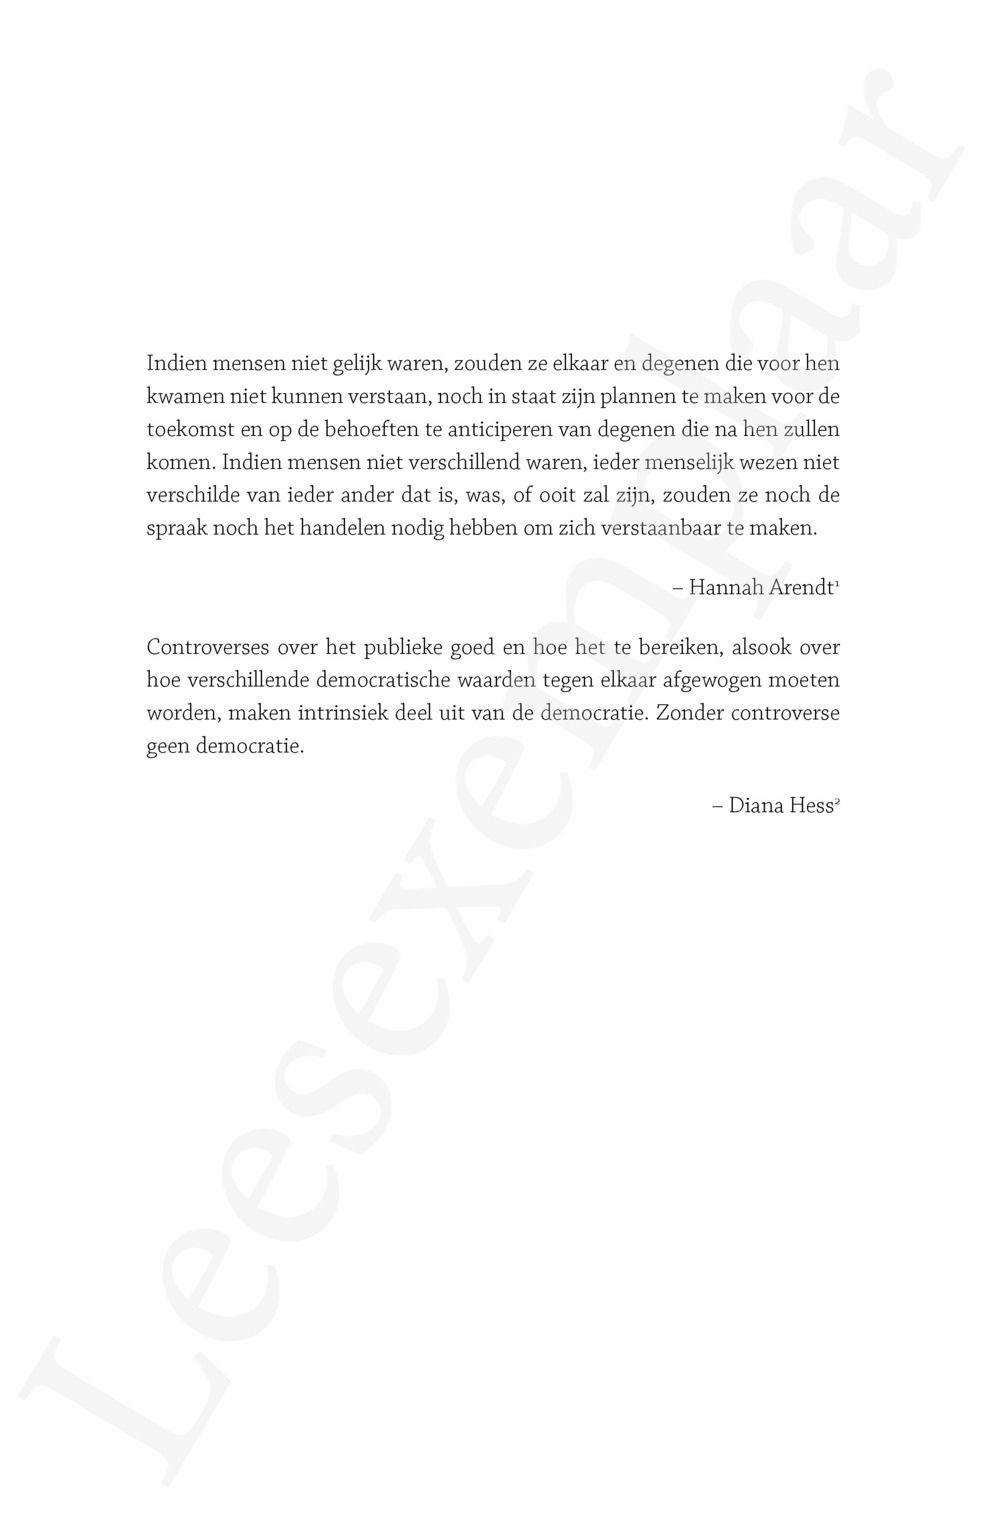 Preview: Omgaan met controverse en polarisatie in de klas